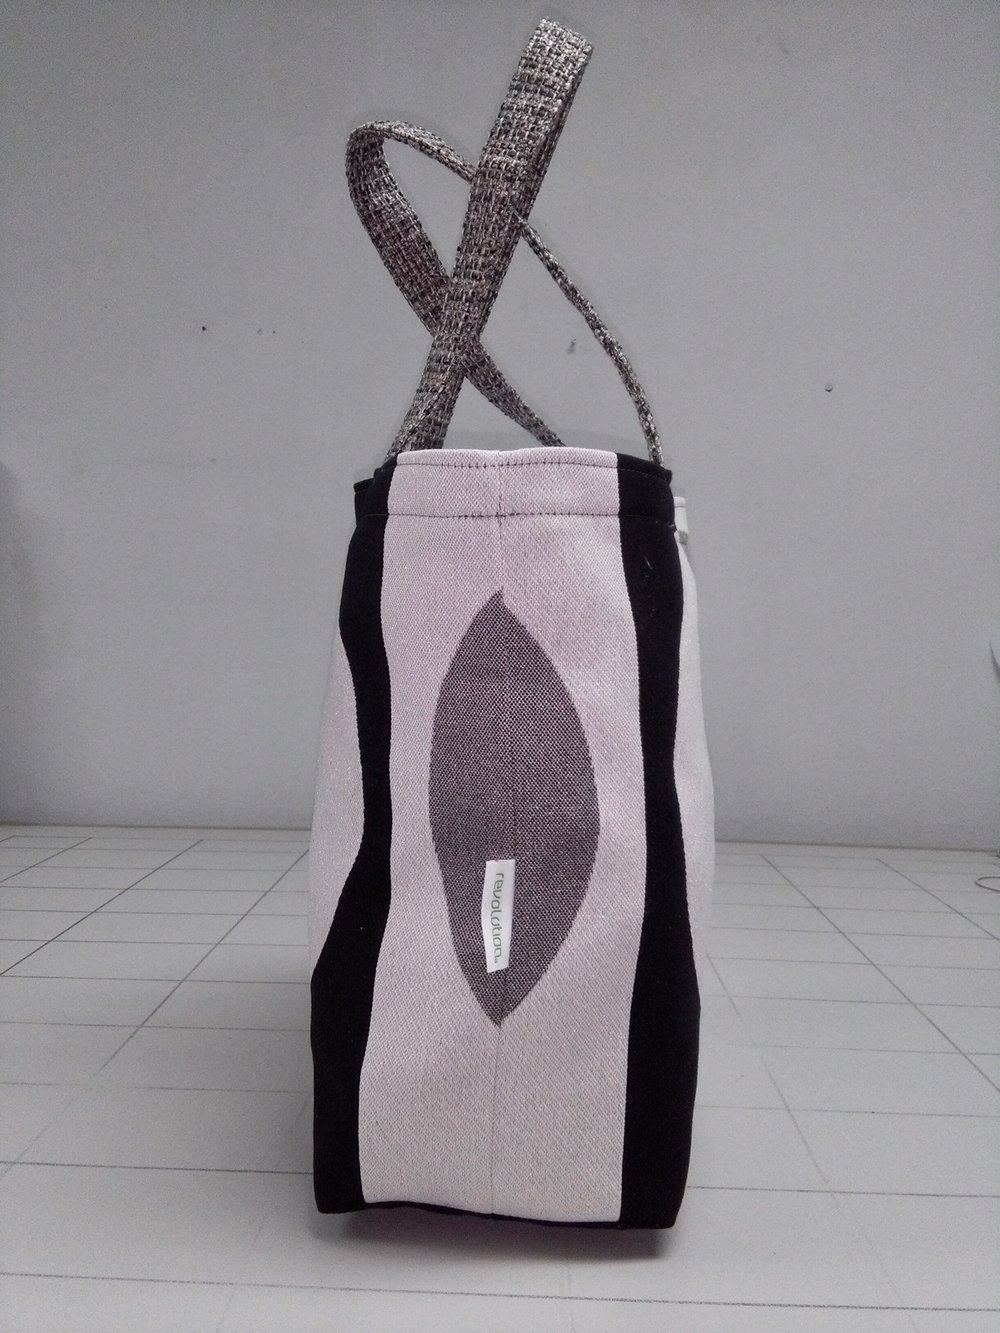 brentwood bag 3.jpeg